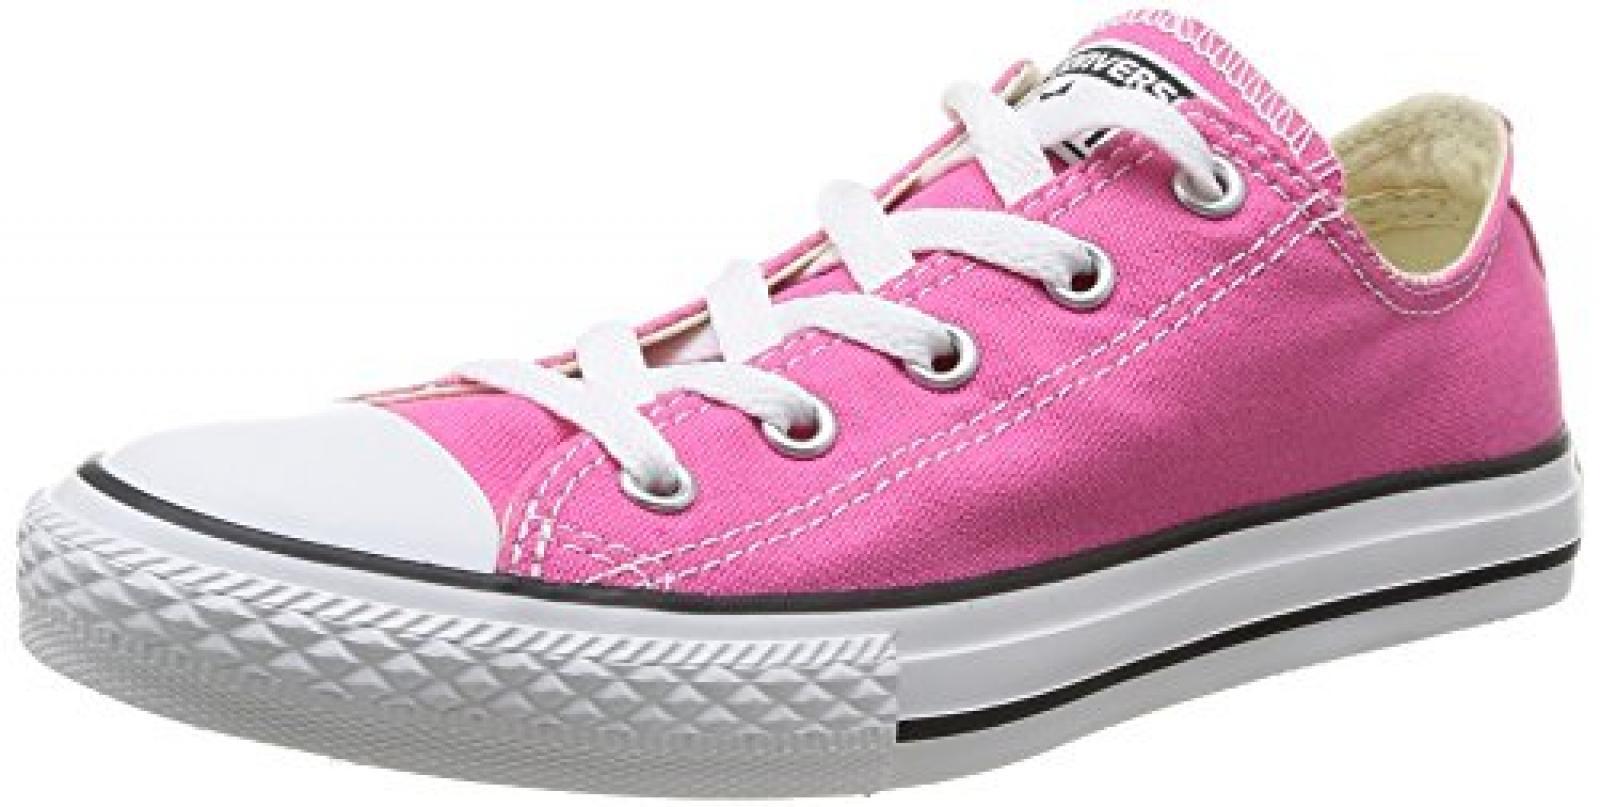 Converse Chuck Taylor All Star Junior Seasonal Ox 15762 Mädchen Sneaker